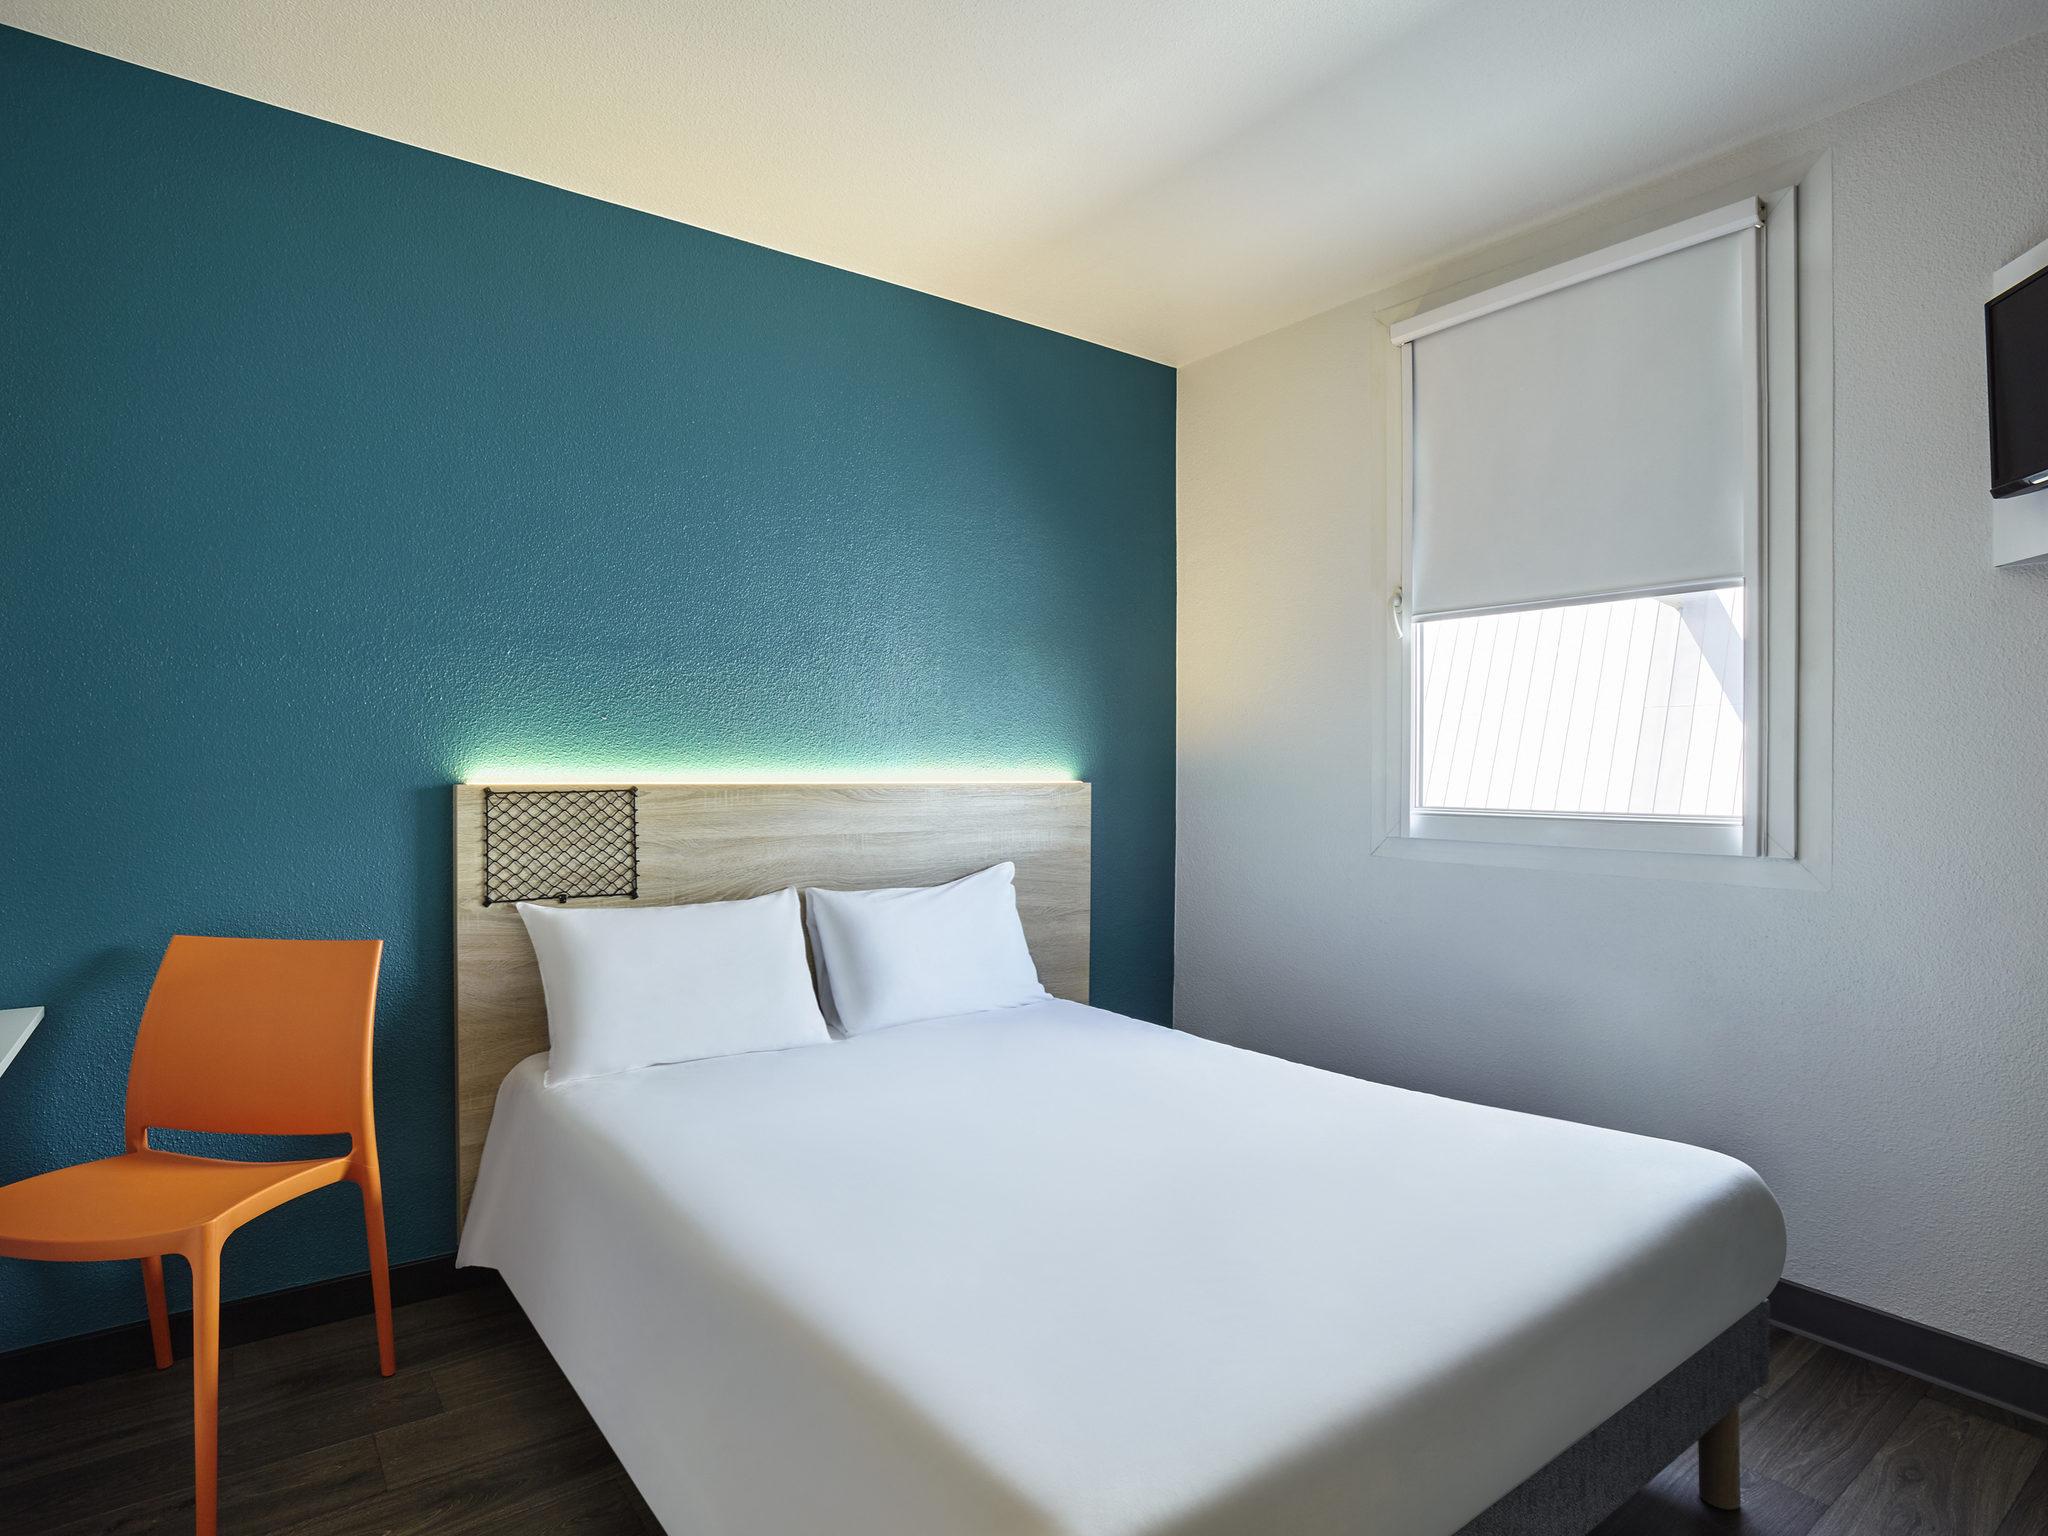 ホテル – hotelF1 Bordeaux Ville Aréna